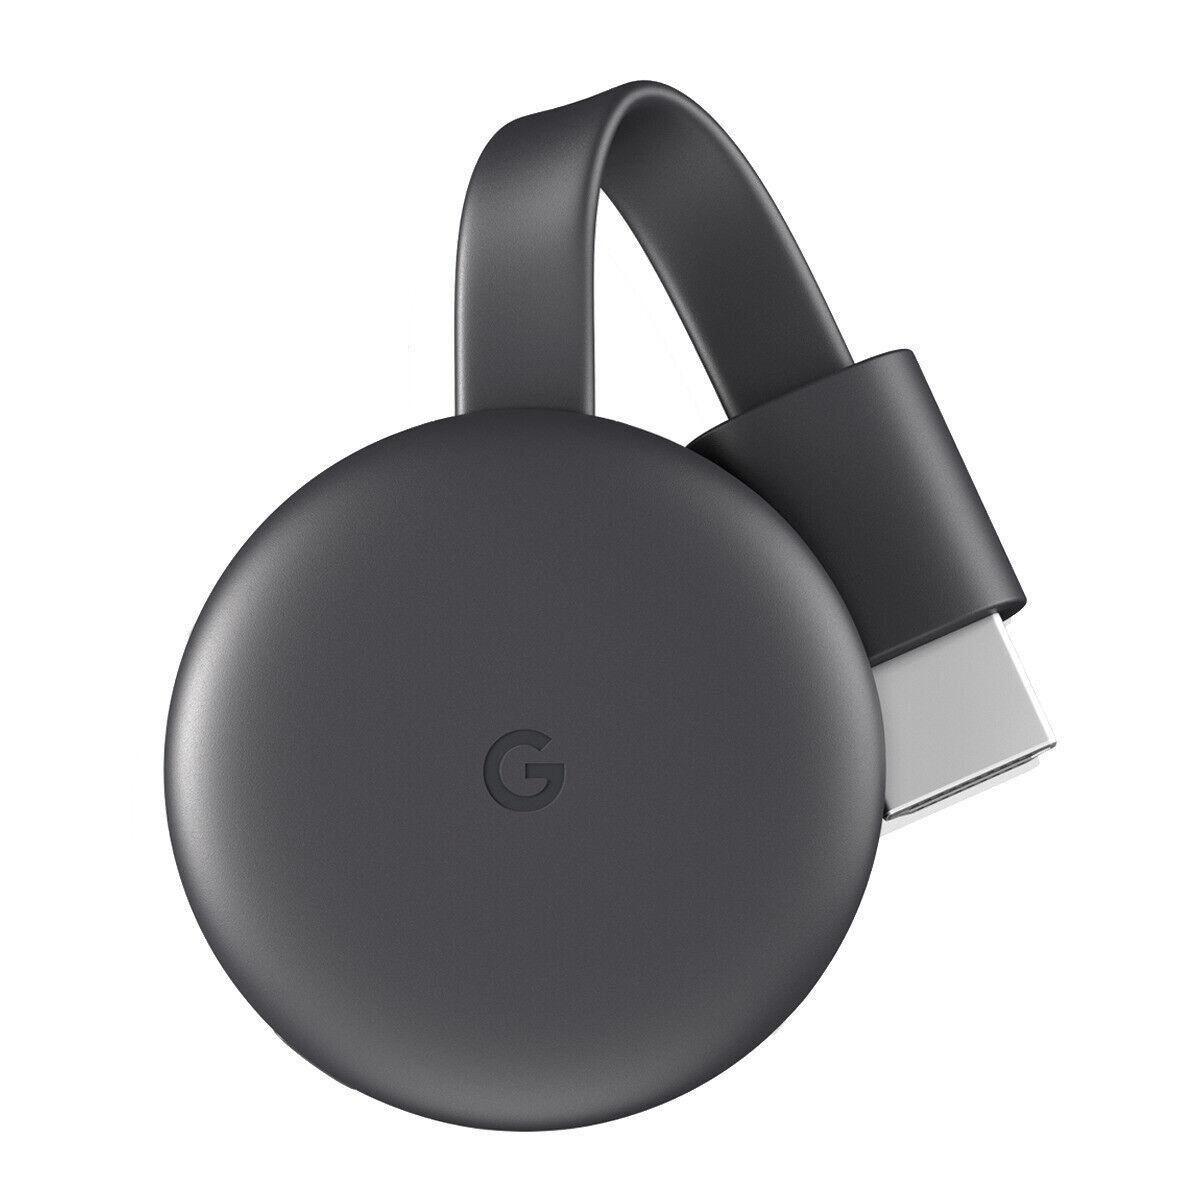 Nuevo Google Chromecast (3.ª generación)